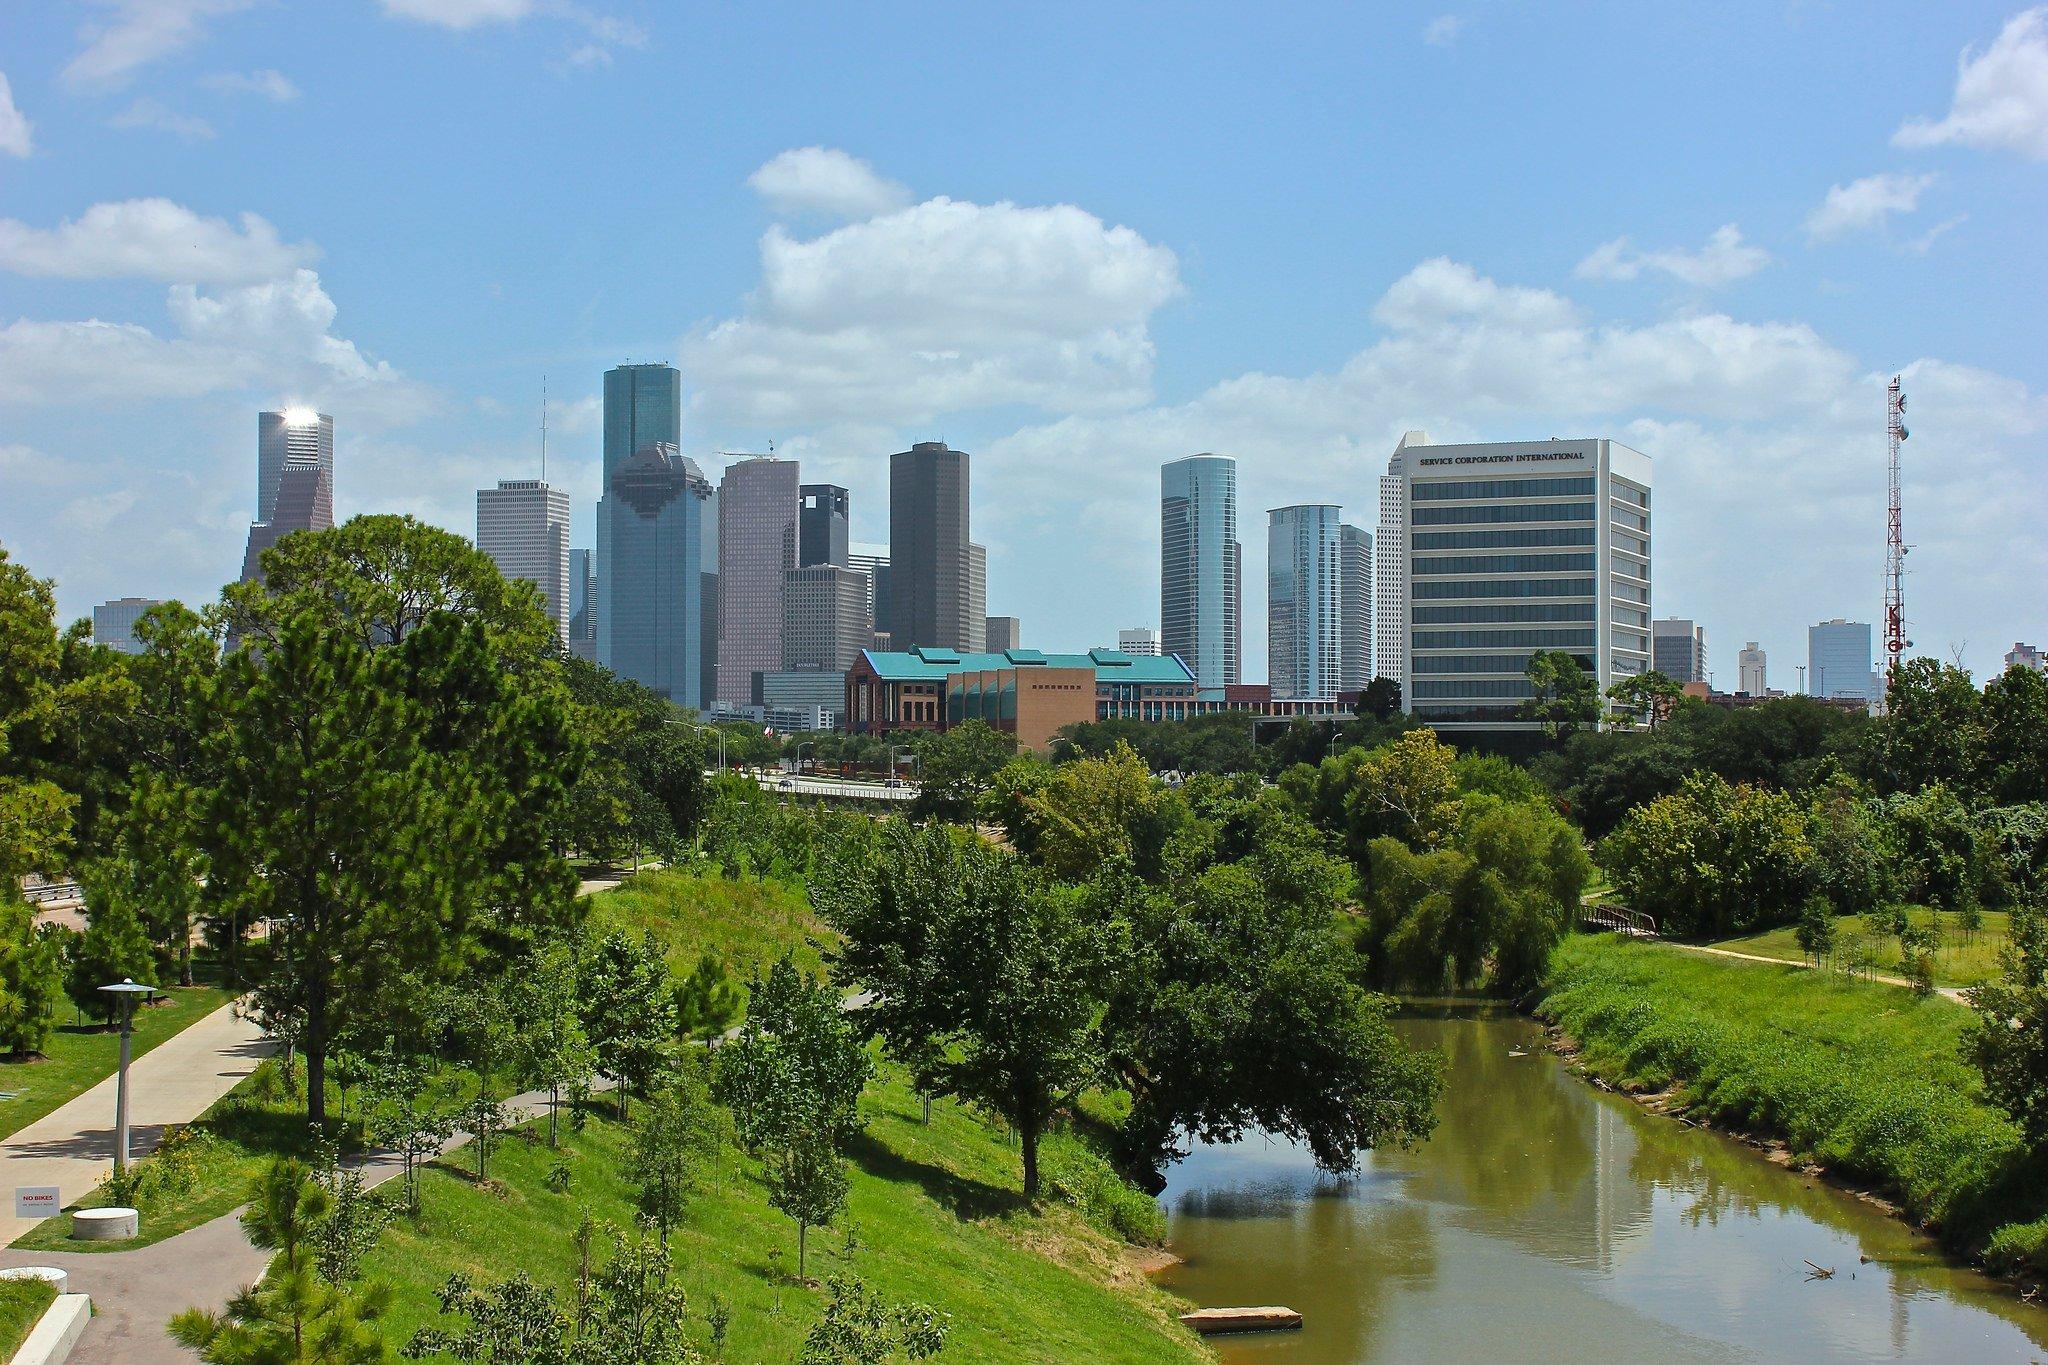 Houston architecture bridges cities City texas Night towers buildings 2048x1365